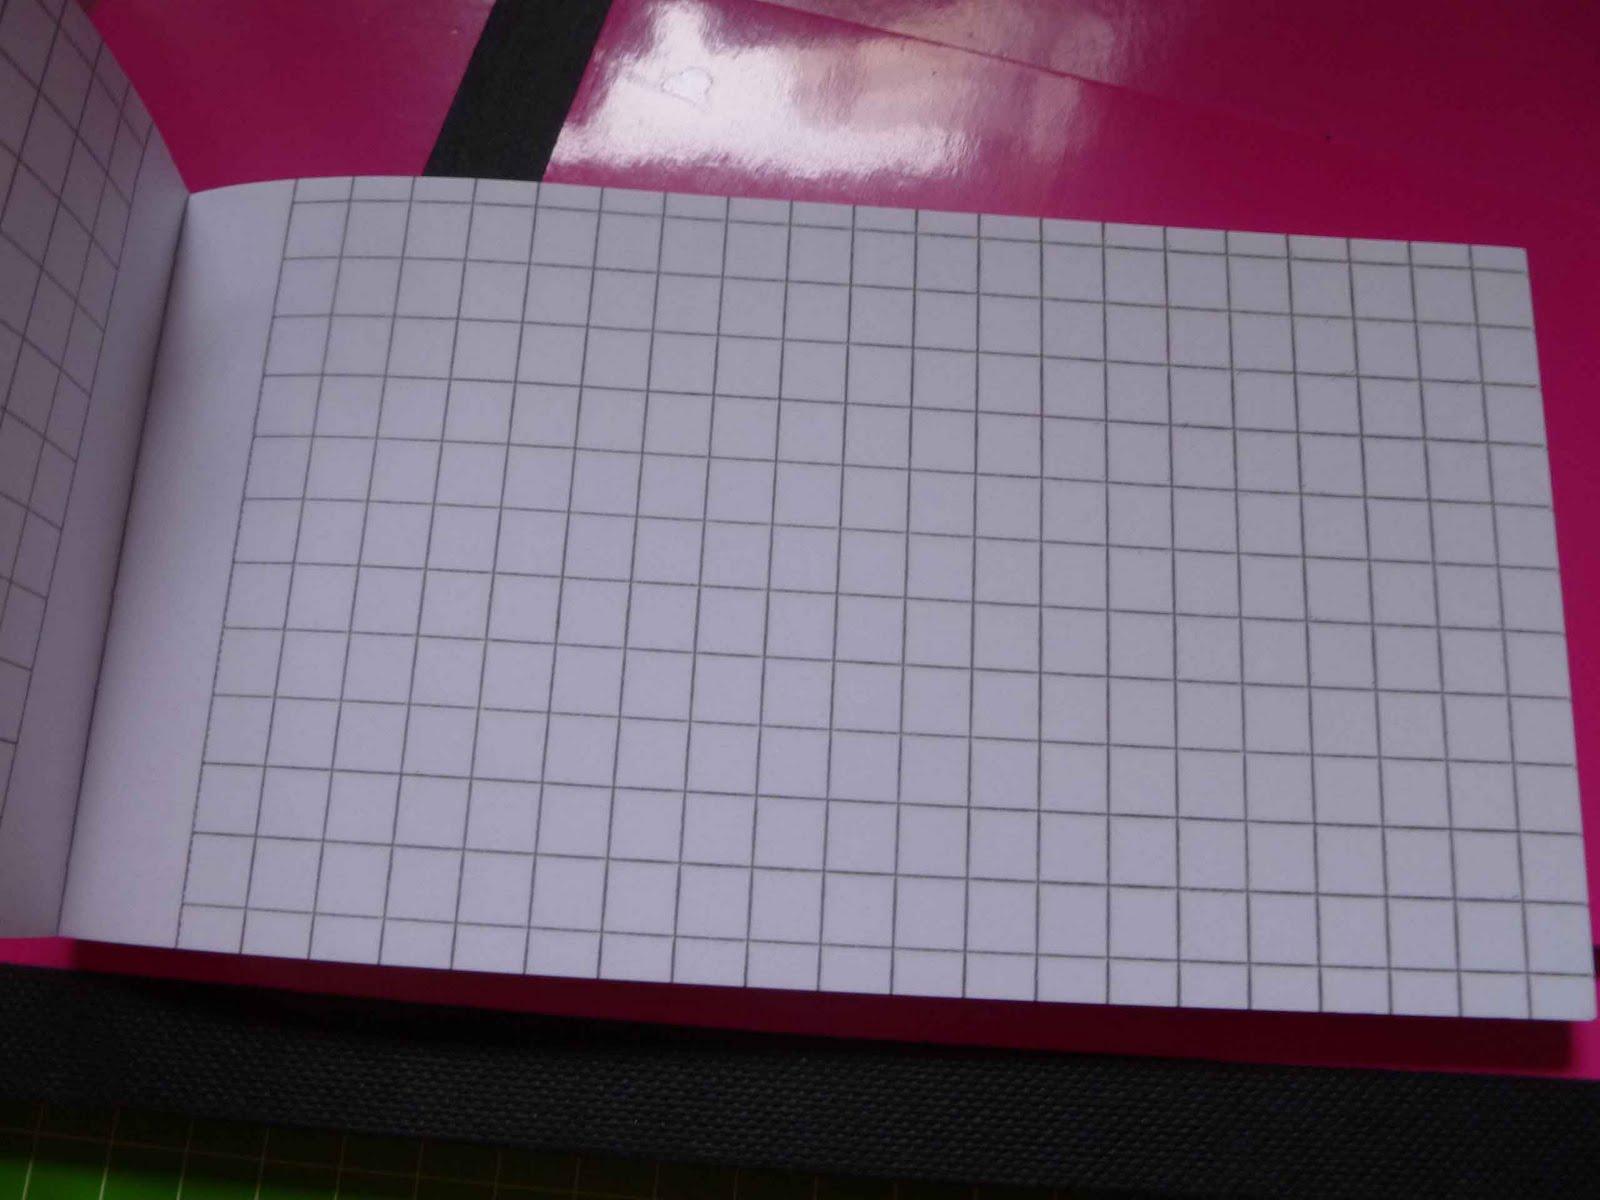 http://2.bp.blogspot.com/-APCnYIoZDc8/TmQwTL4qyMI/AAAAAAAAAZw/dTH_rBmPzTk/s1600/graph%2Bpaper.jpg